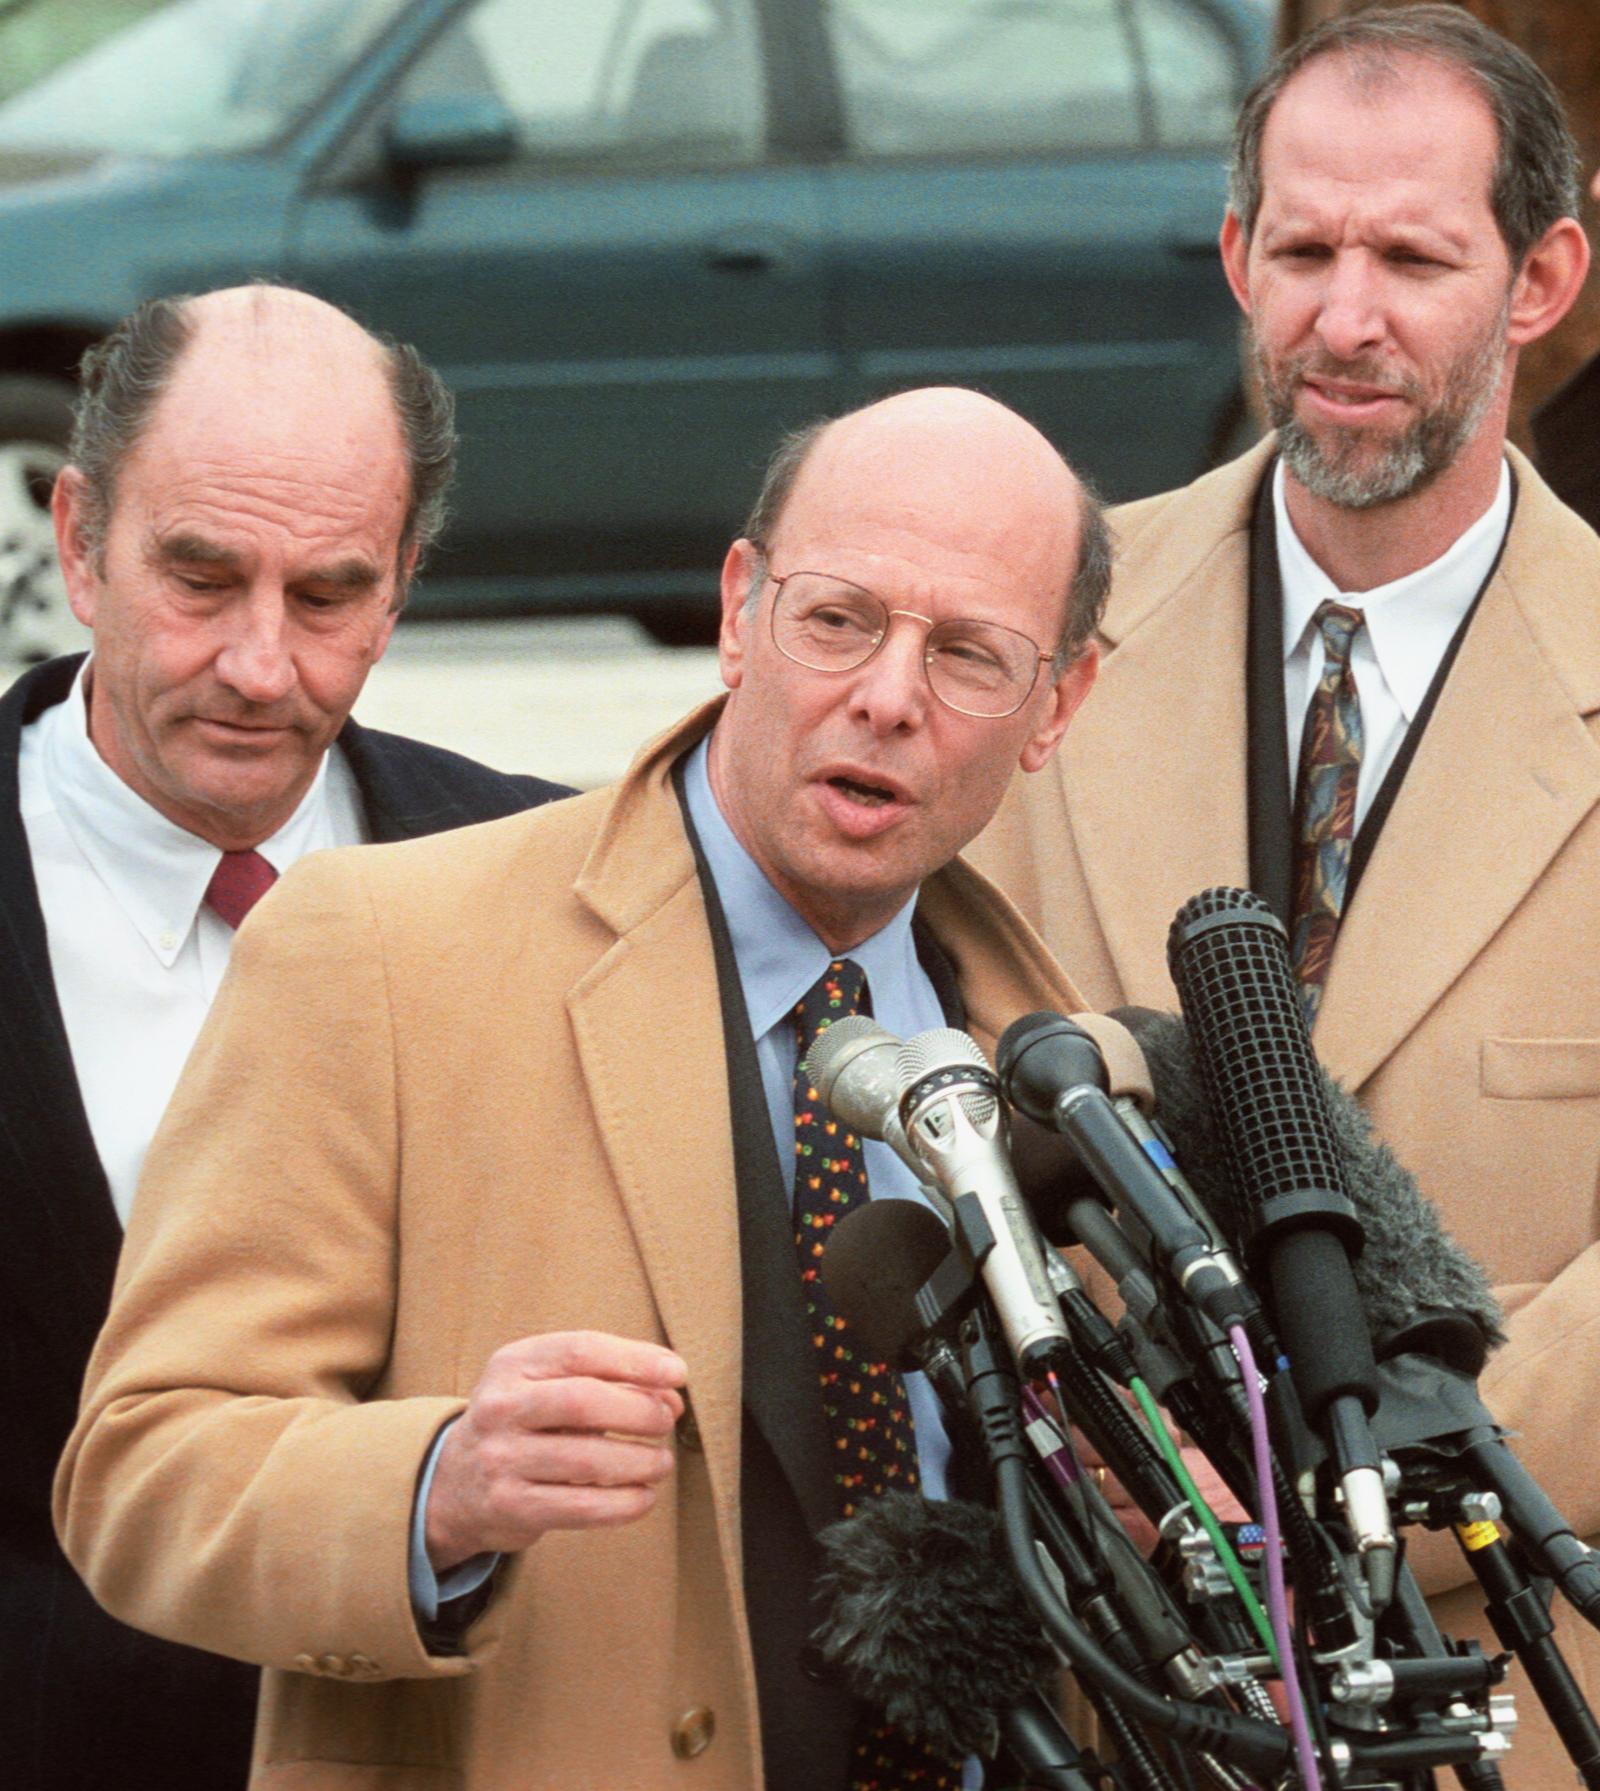 Attorney Michael Ratner speaking to press